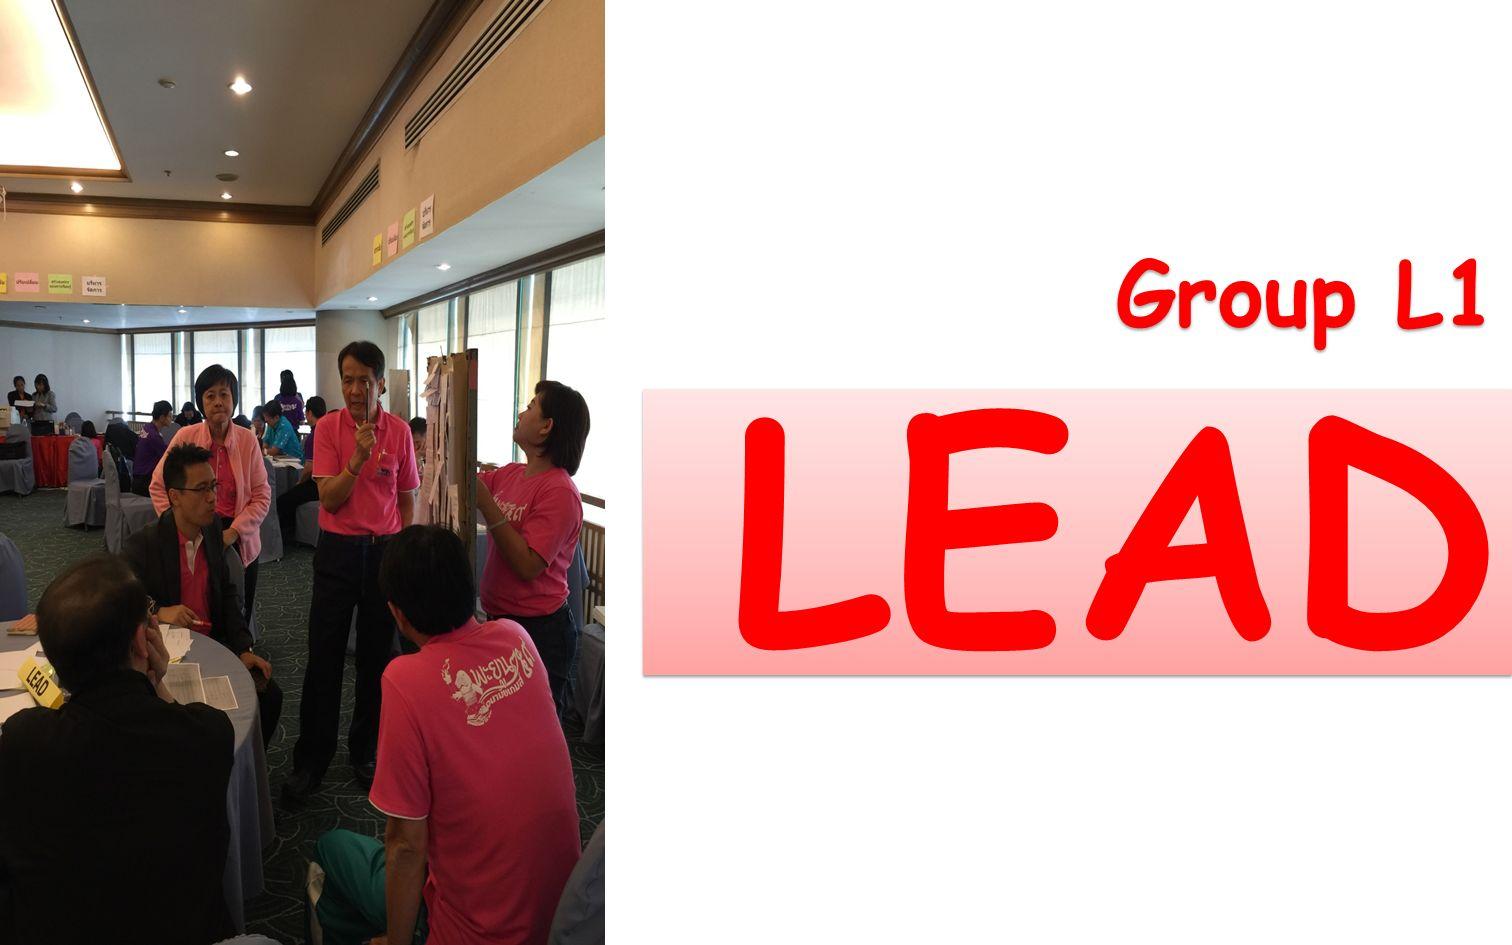 LEAD Group L1